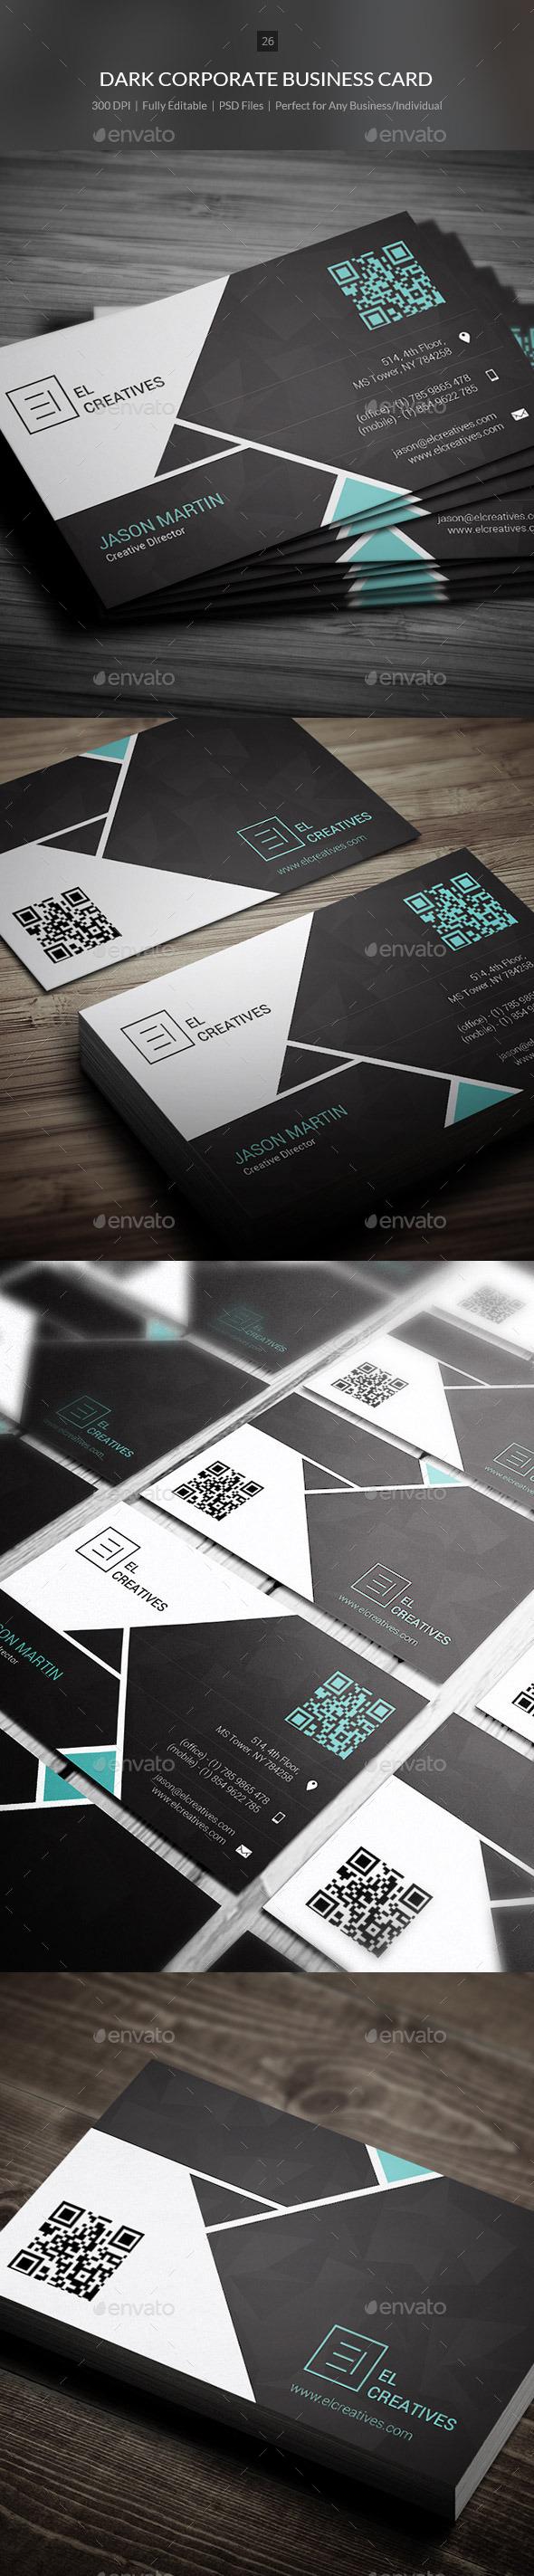 Dark Corporate Business Card - 26 - Corporate Business Cards